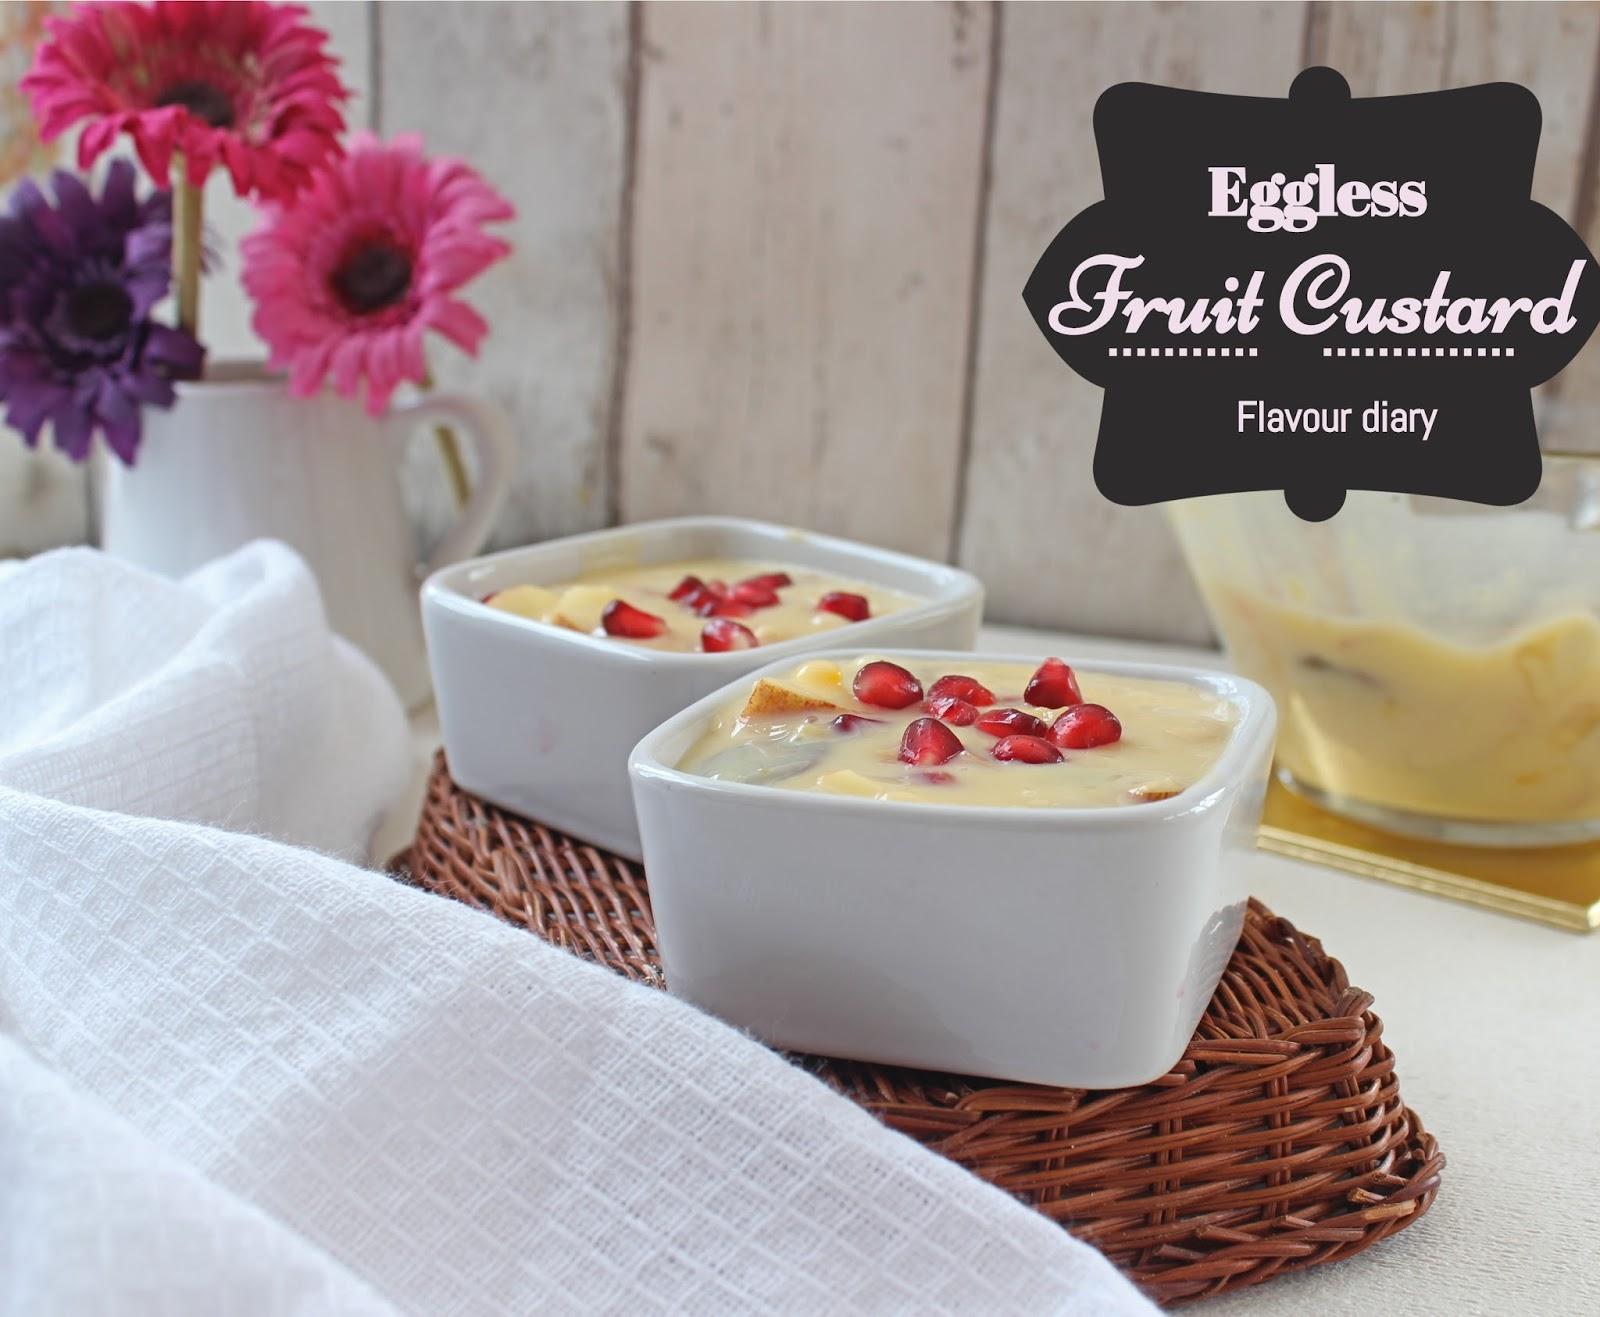 Eggless Indian Fruit Custard recipe